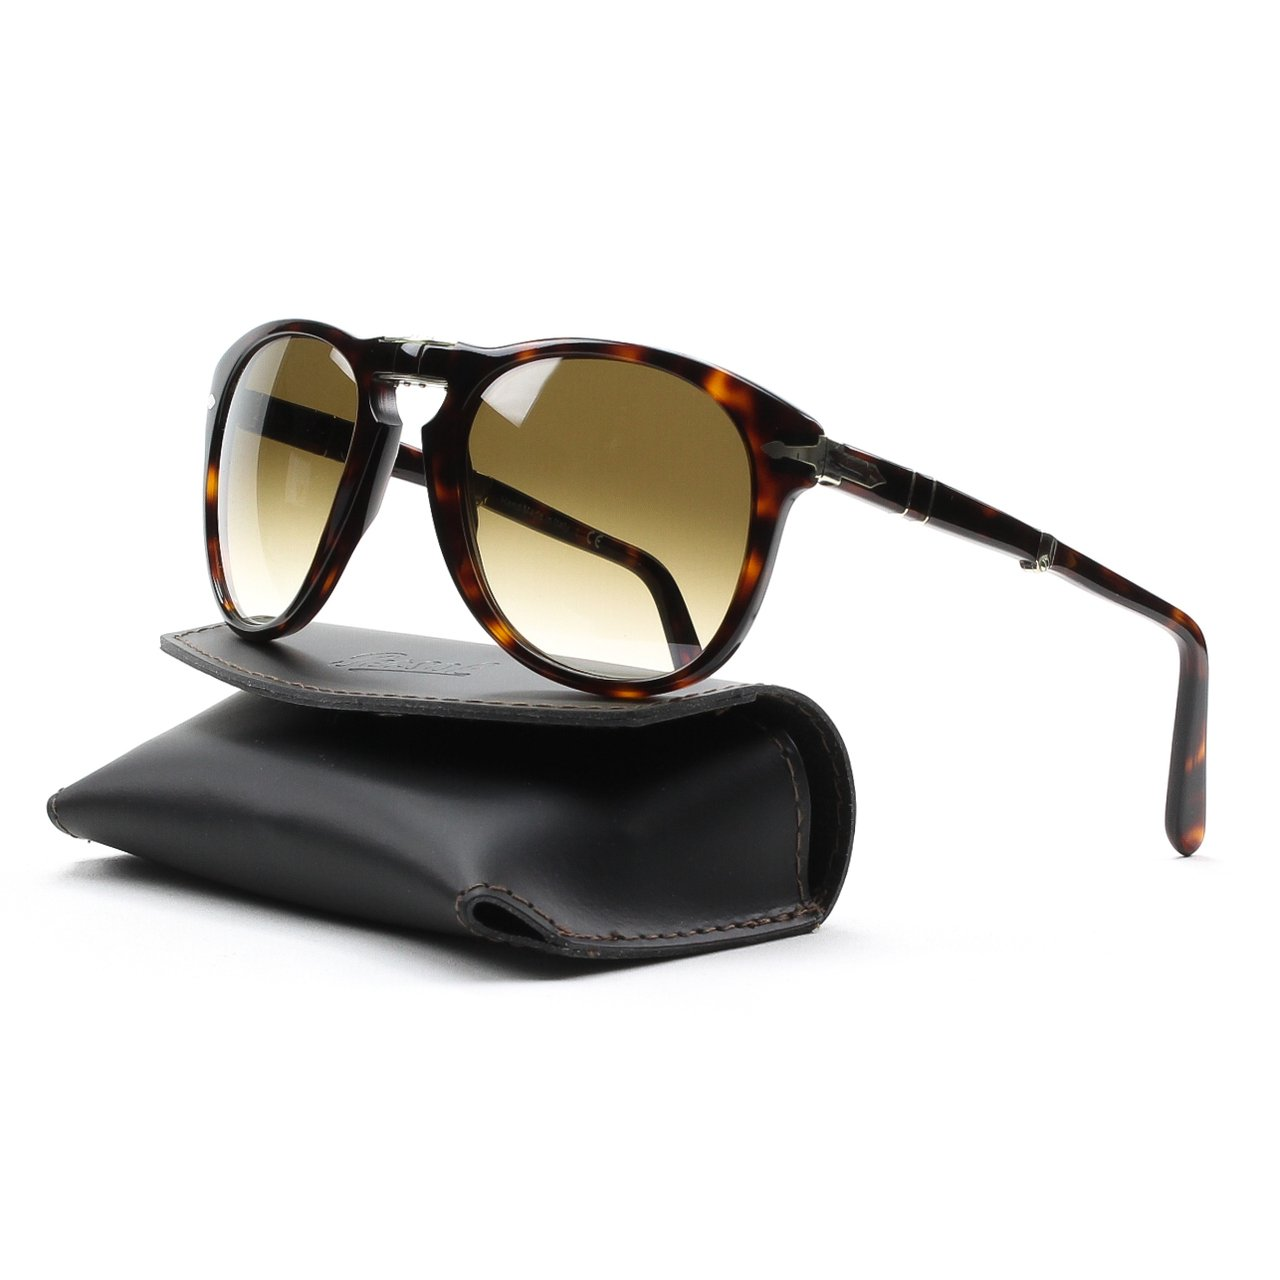 Persol Men's PO0714 Sunglasses Havana / Crystal Brown Gradient 52mm